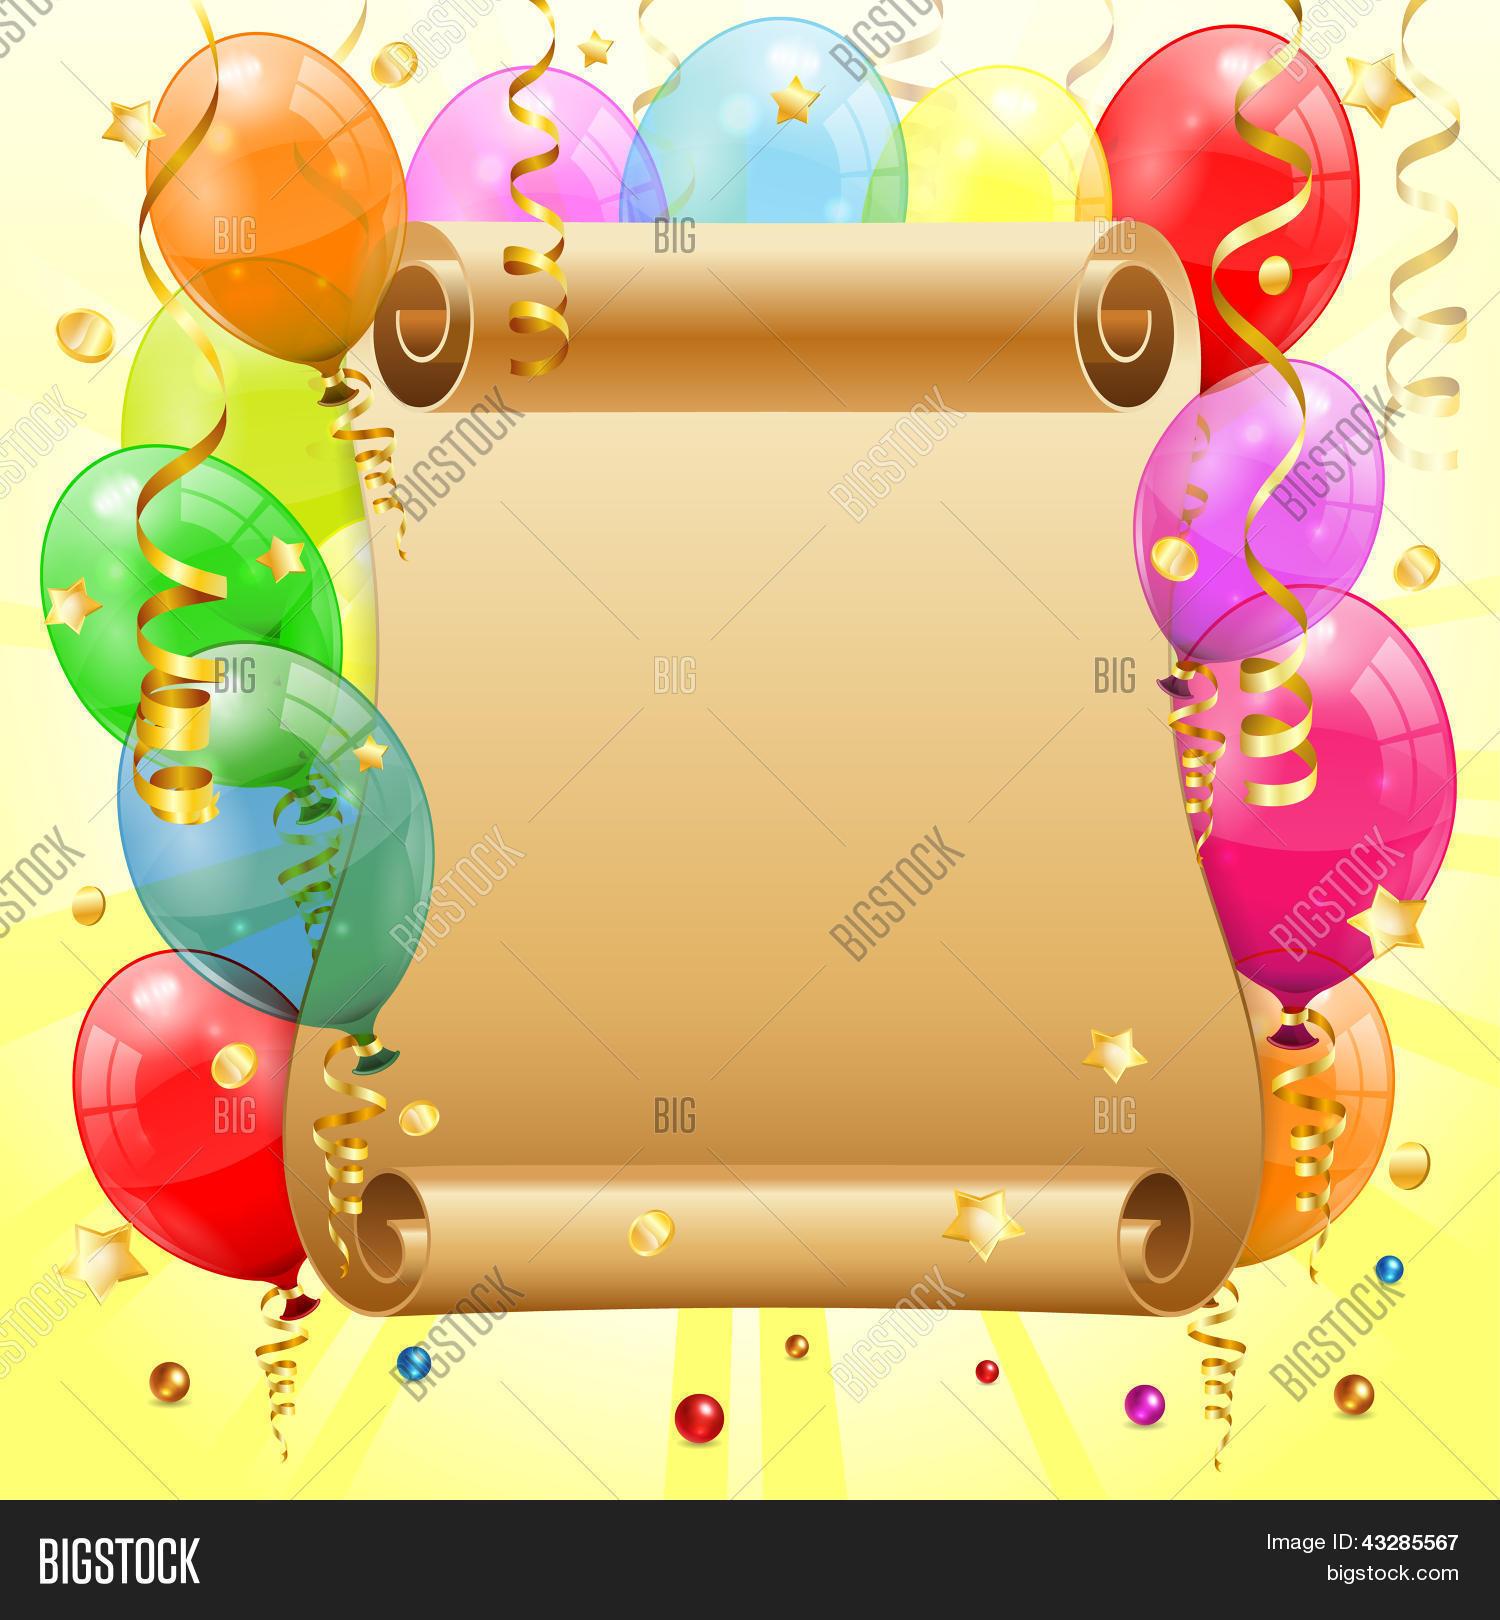 Verjaardag Vector En Foto Gratis Proefversie Bigstock